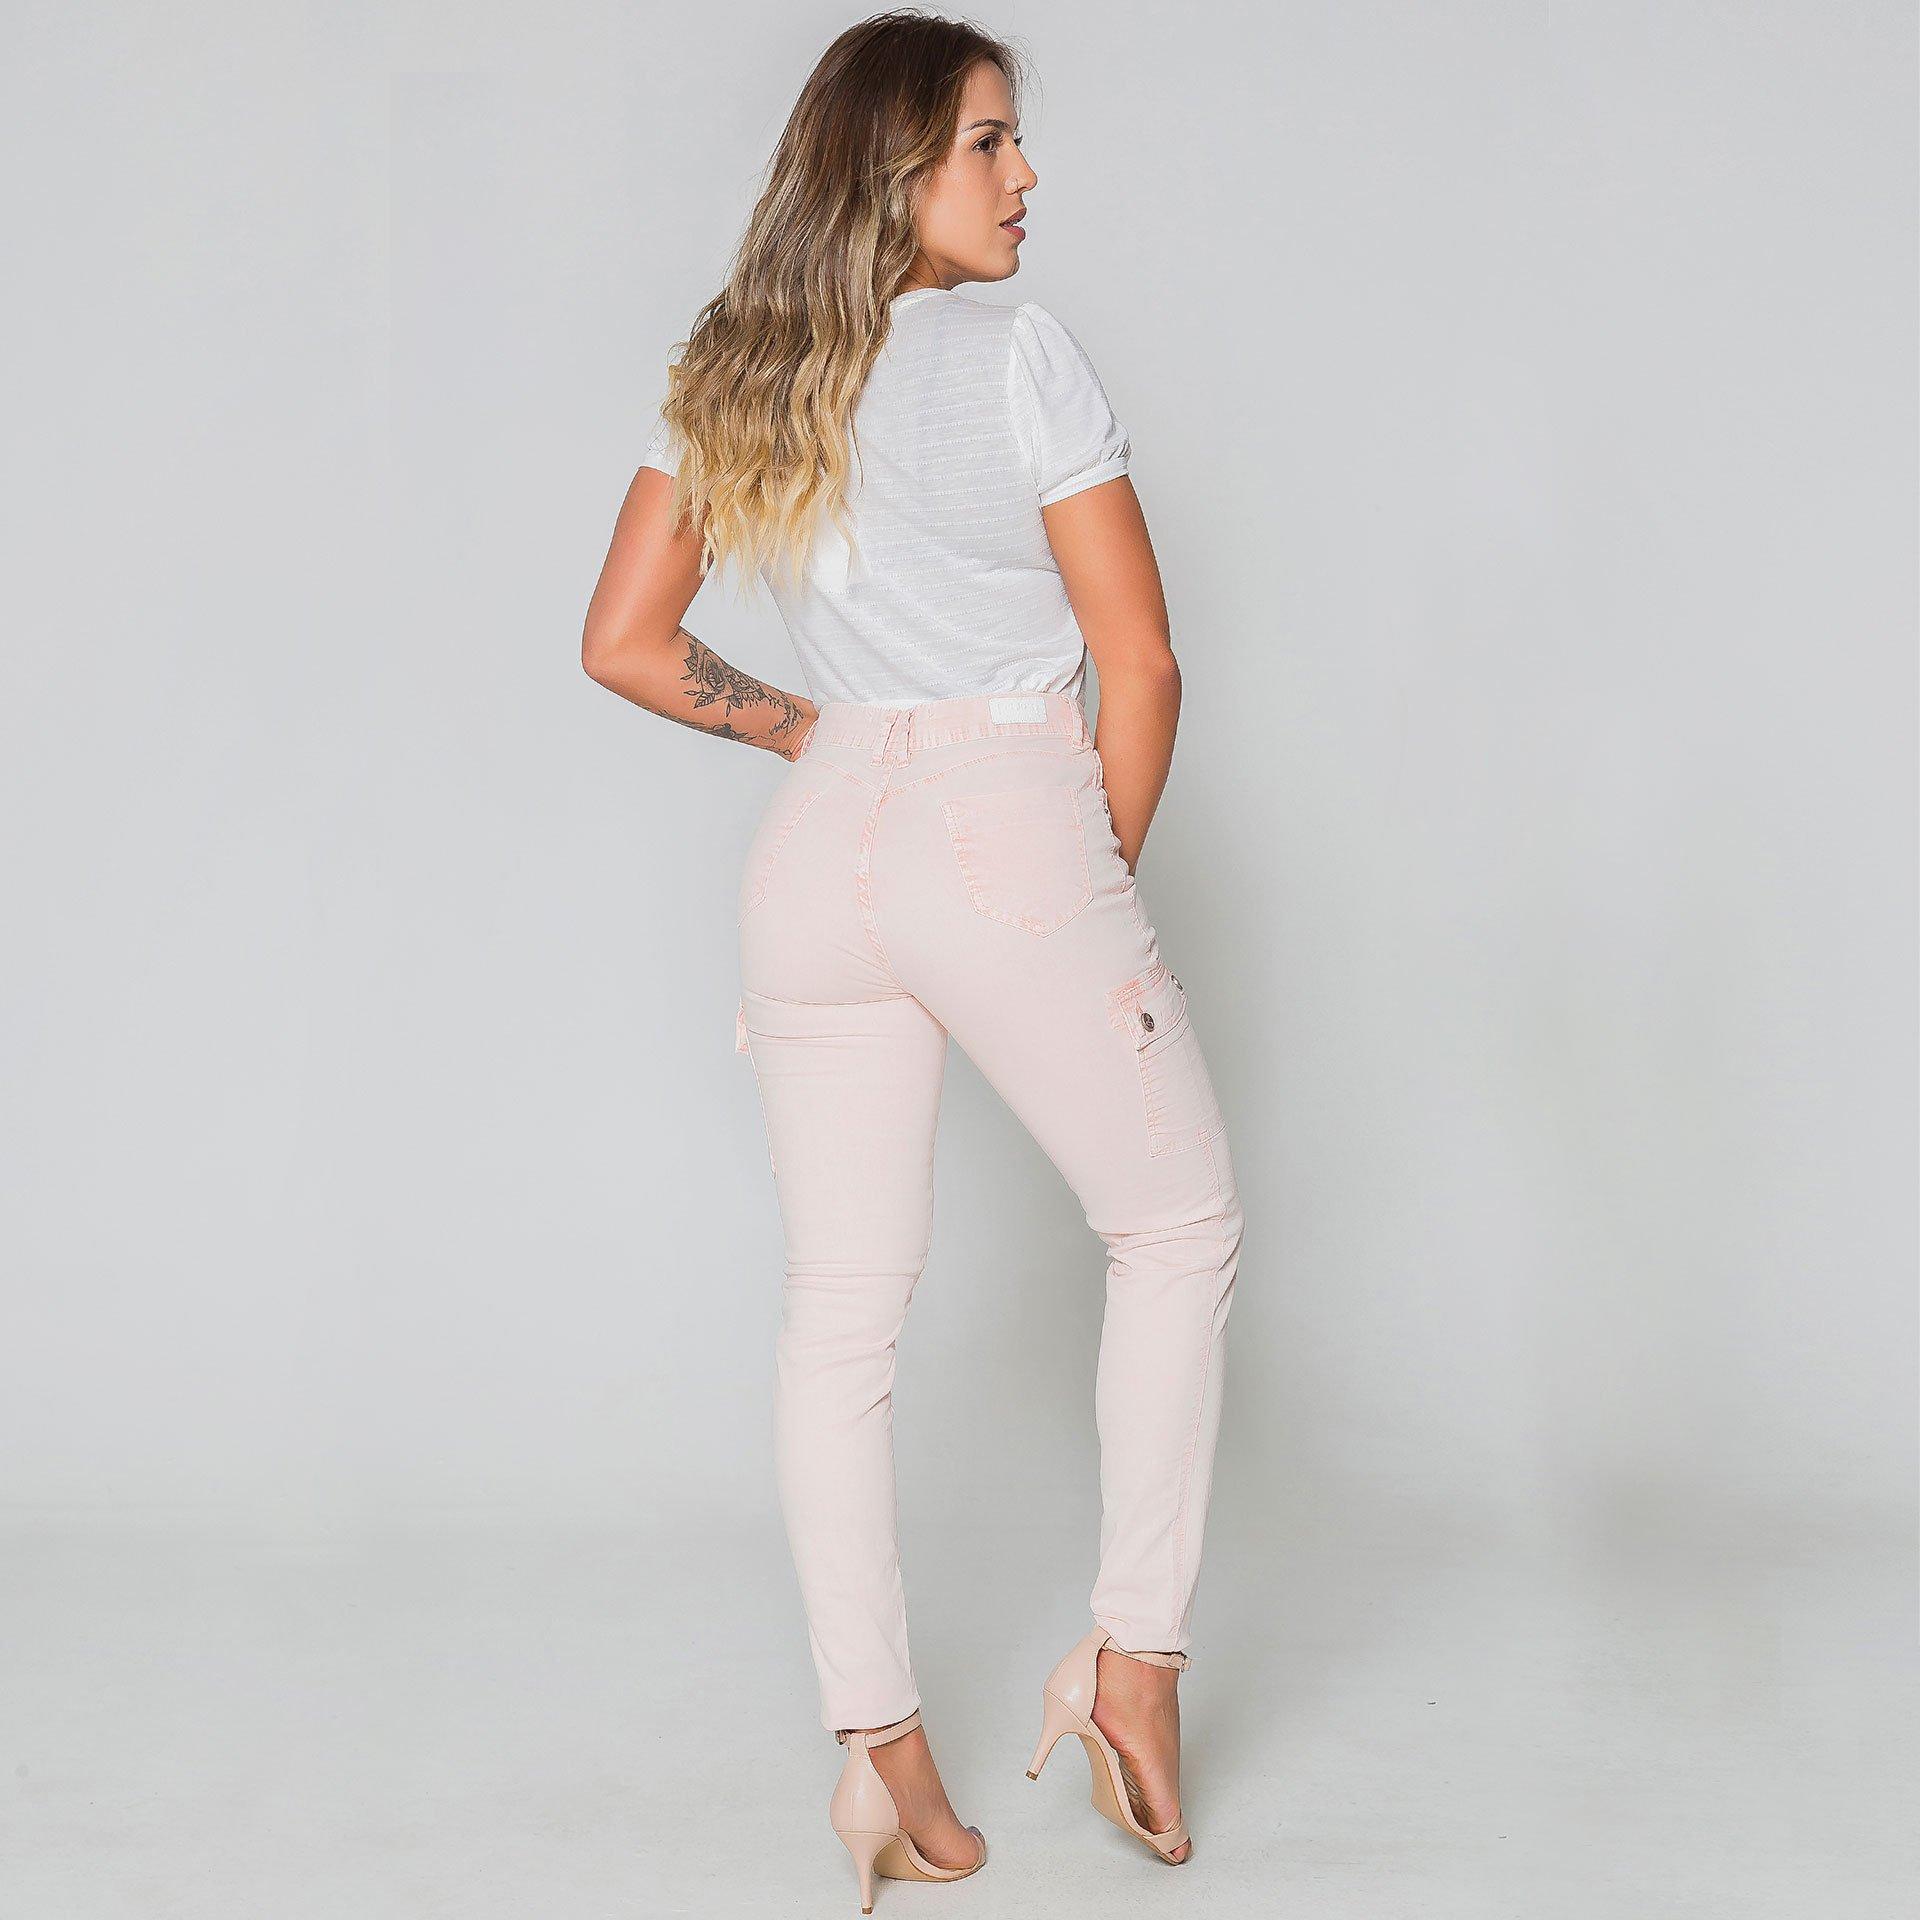 Calça Sarja - Rosa Claro